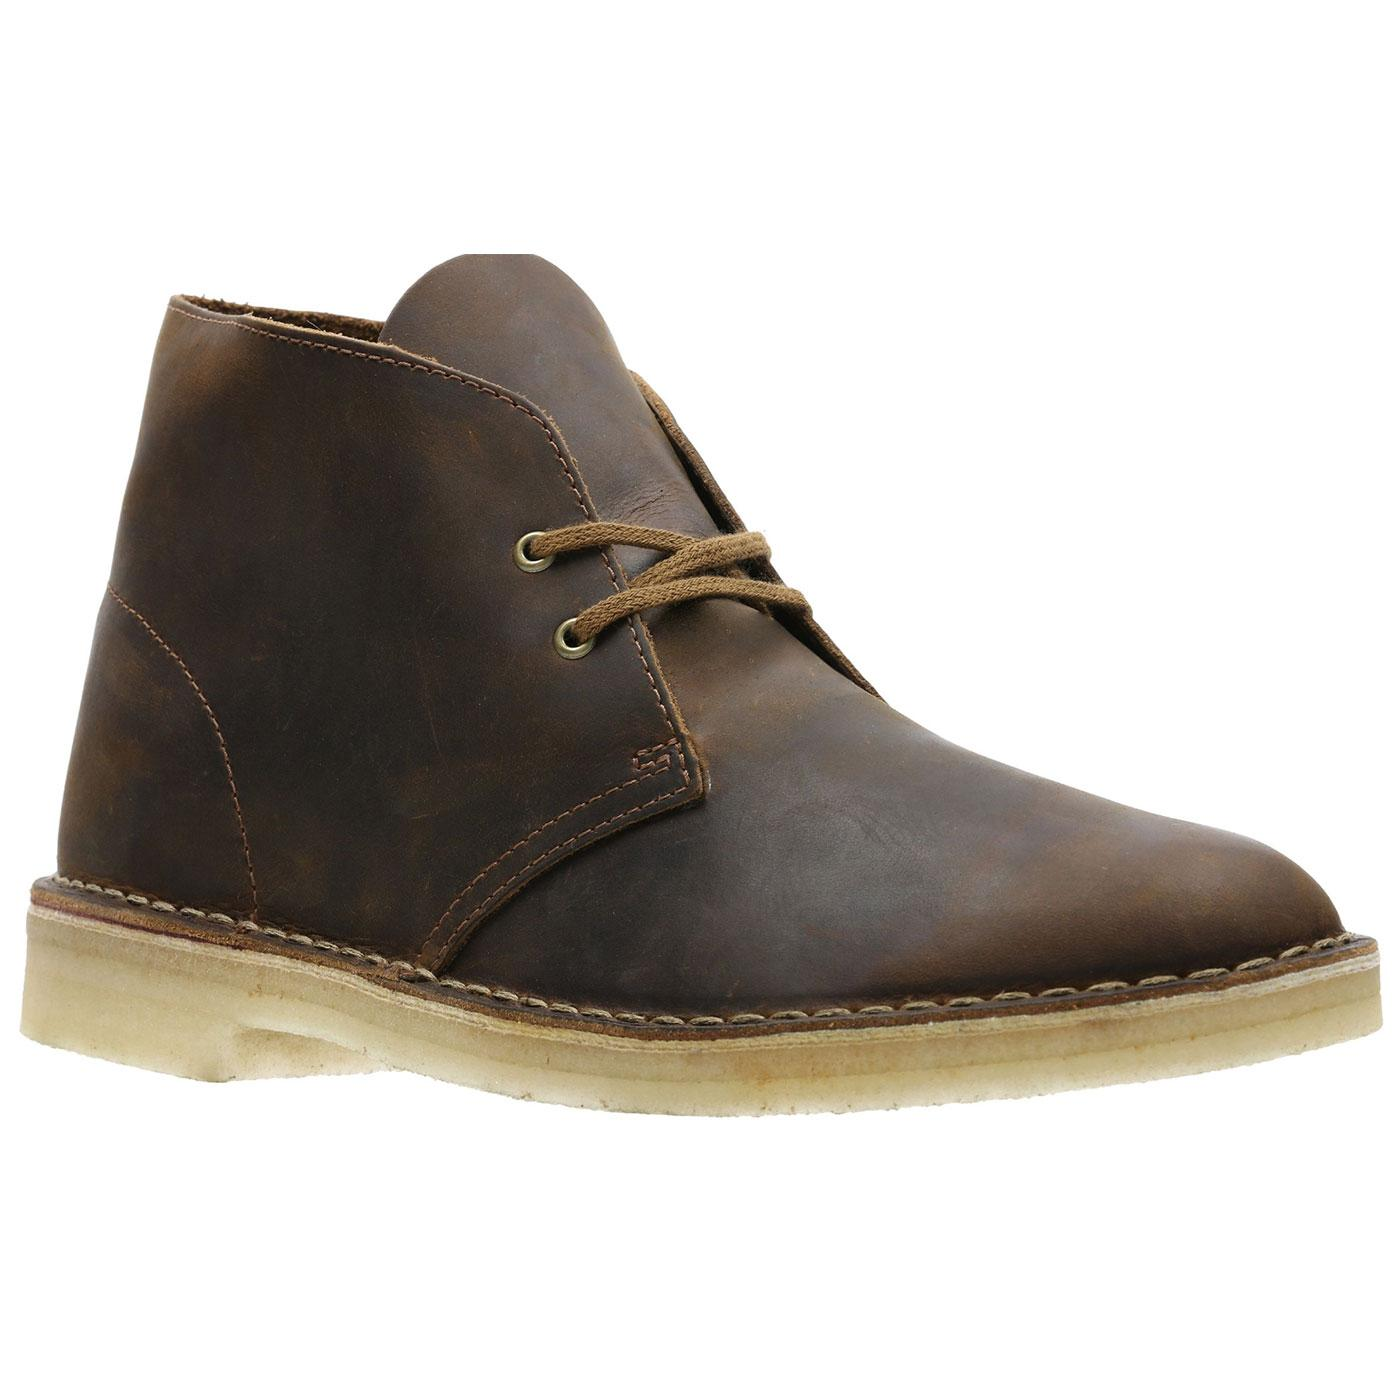 CLARKS ORIGINALS Men's Mod Desert Boots BEESWAX